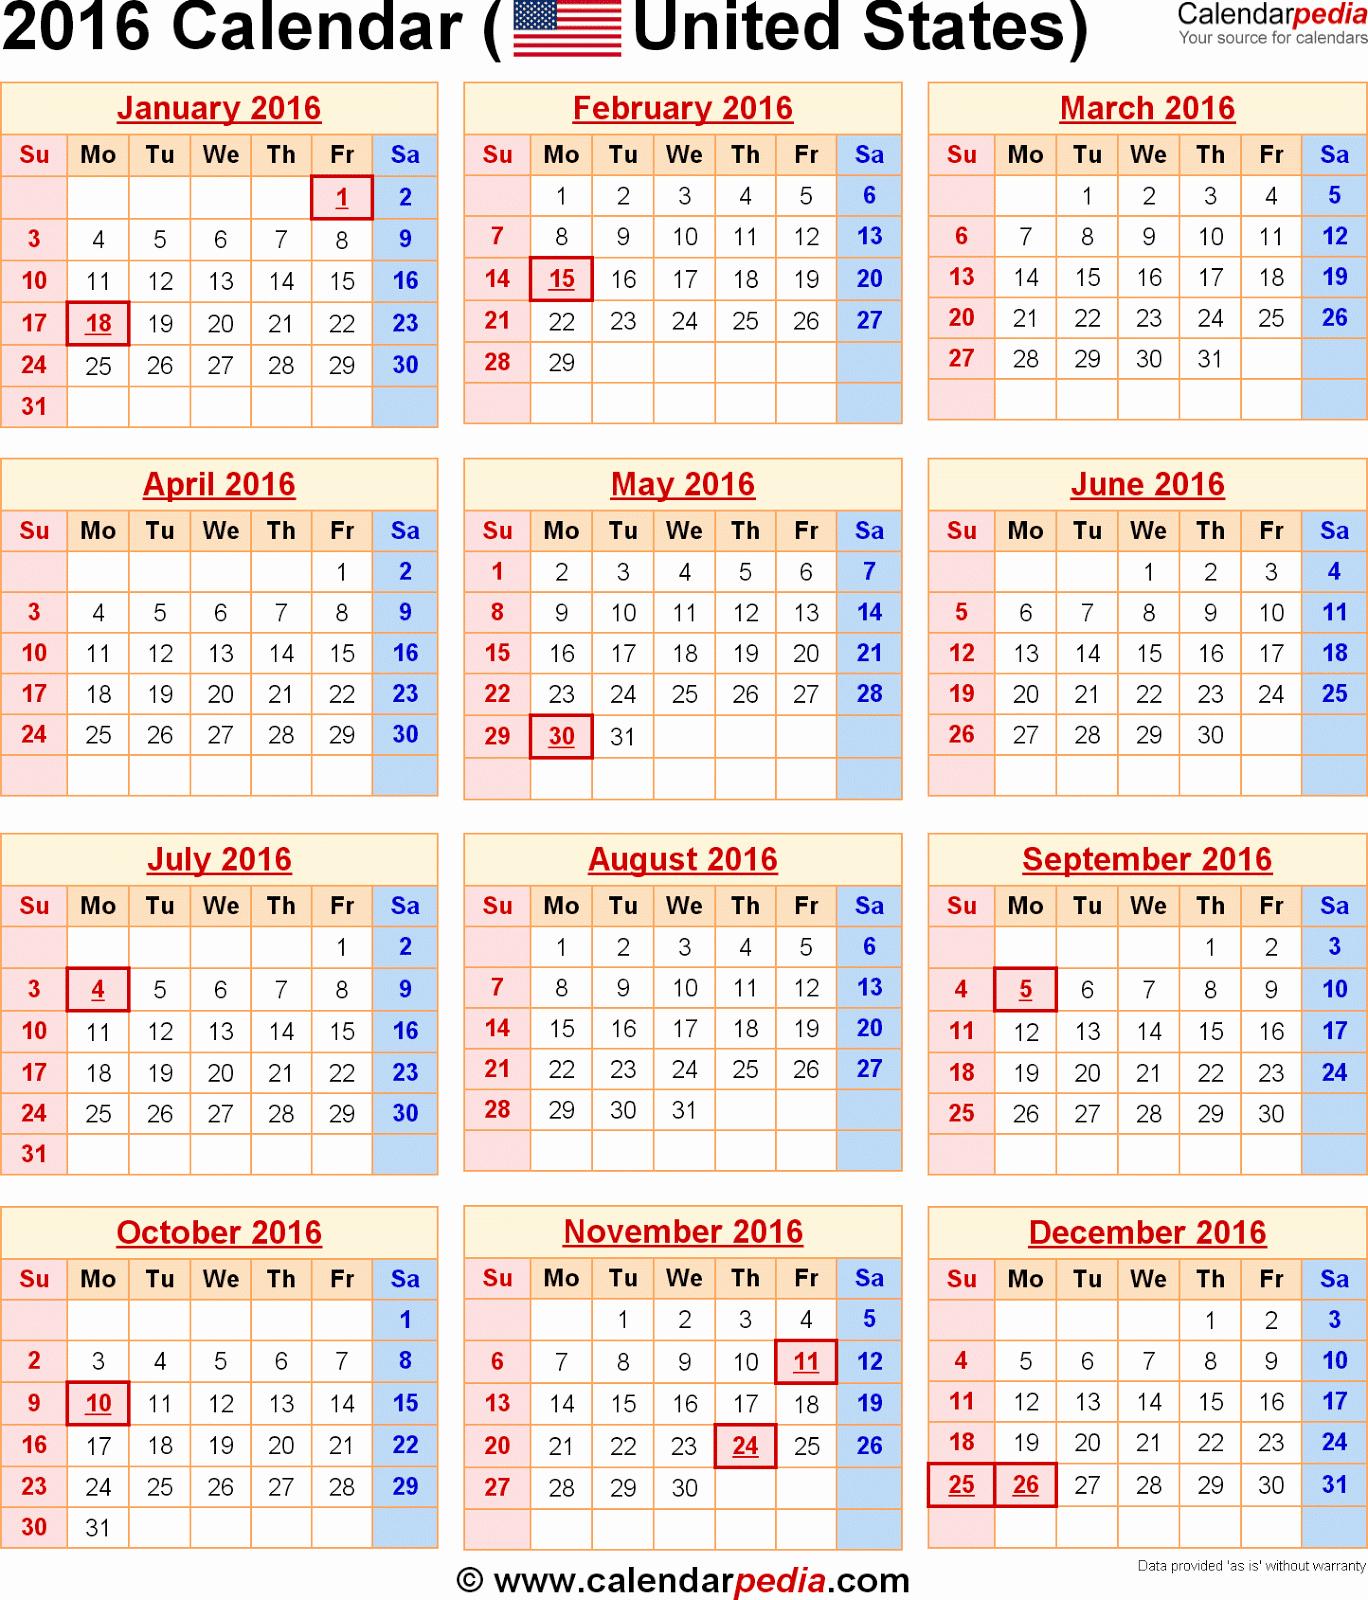 Printable 2016 Calendars with Holidays New 2016 Calendar with Federal Holidays Printable